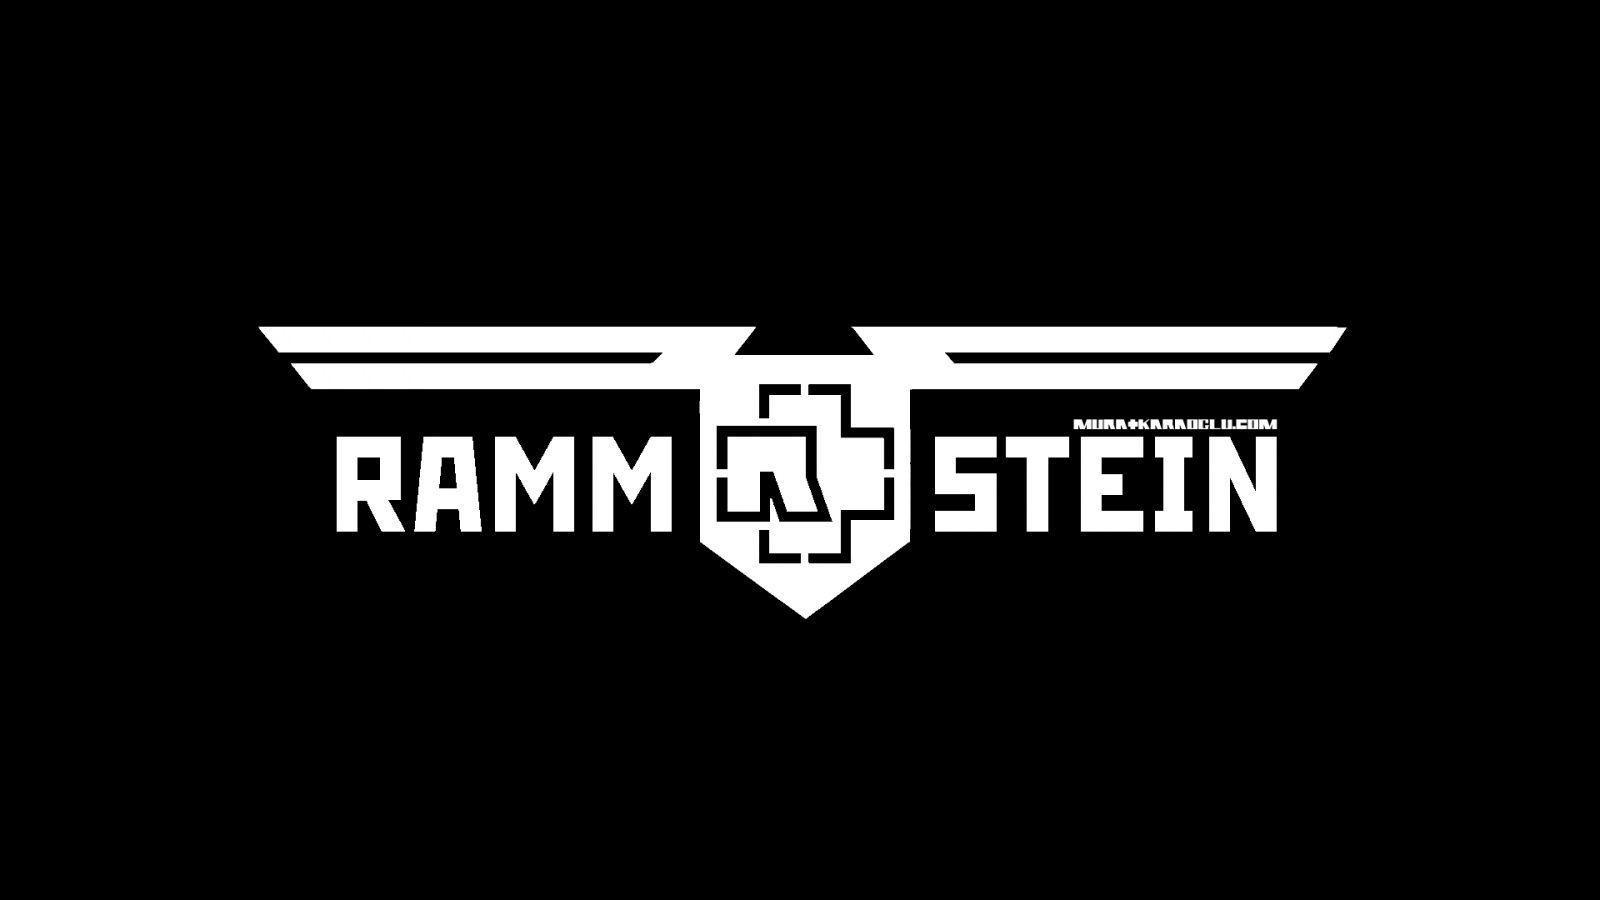 Rammstein wallpapers (wallpaper 1-24 of 34)